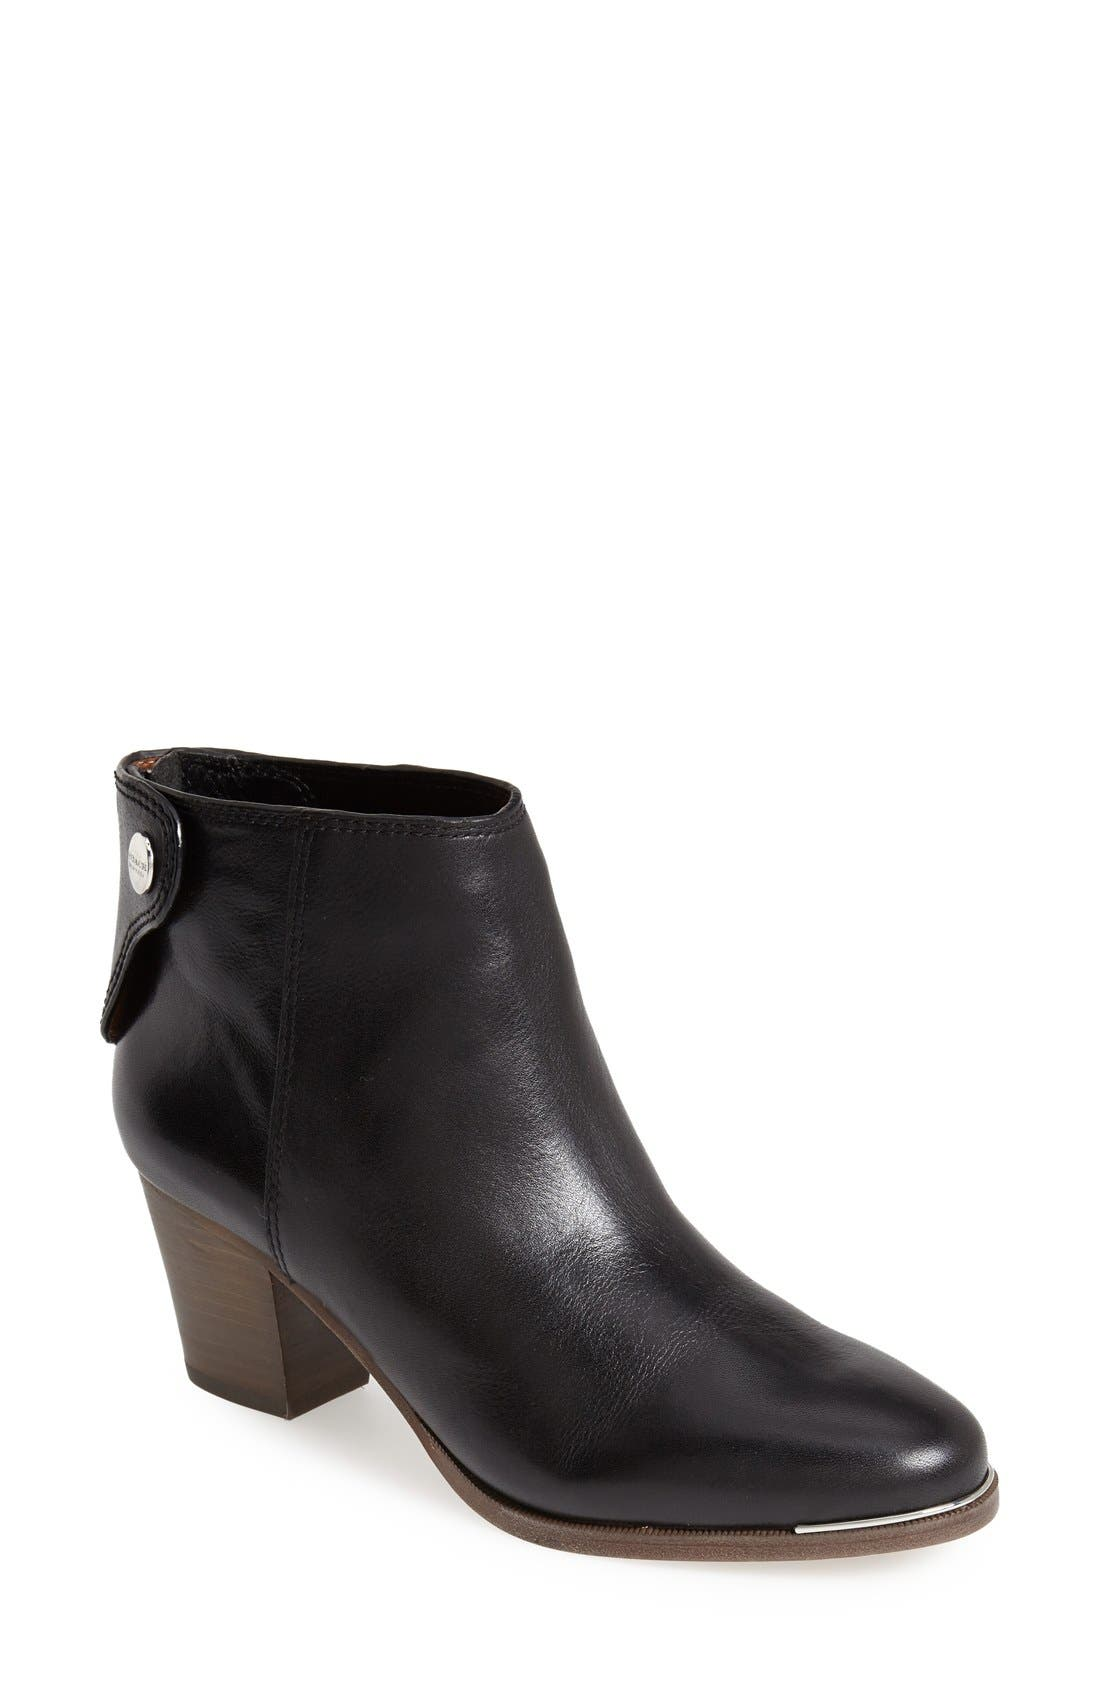 Main Image - COACH 'Waldorf' Leather Bootie (Women)